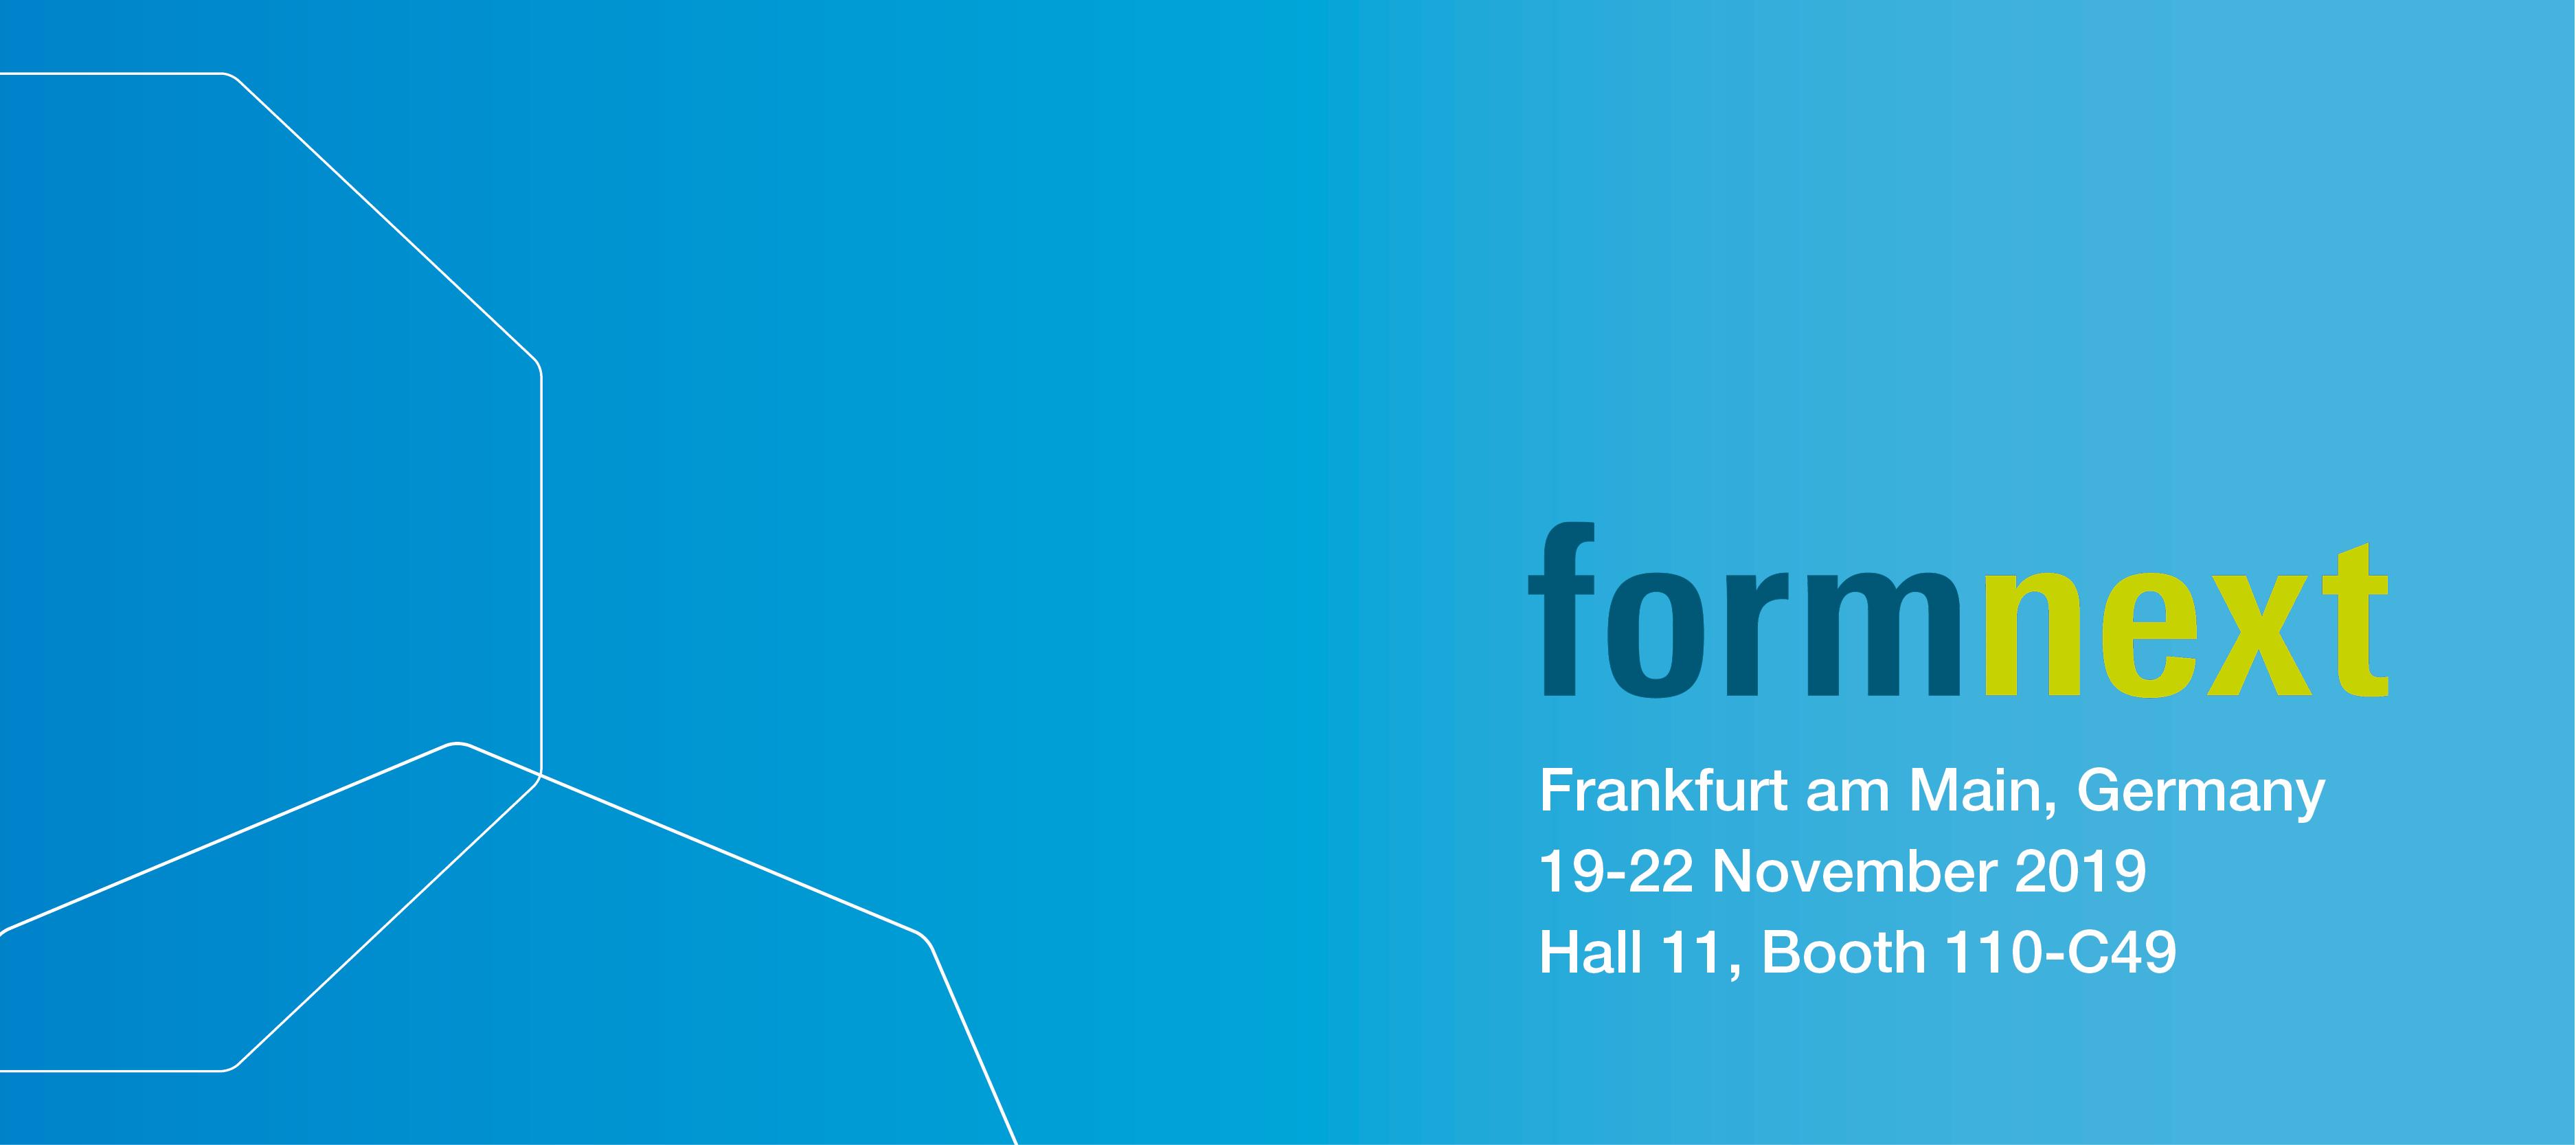 Formnext, 19-22 November